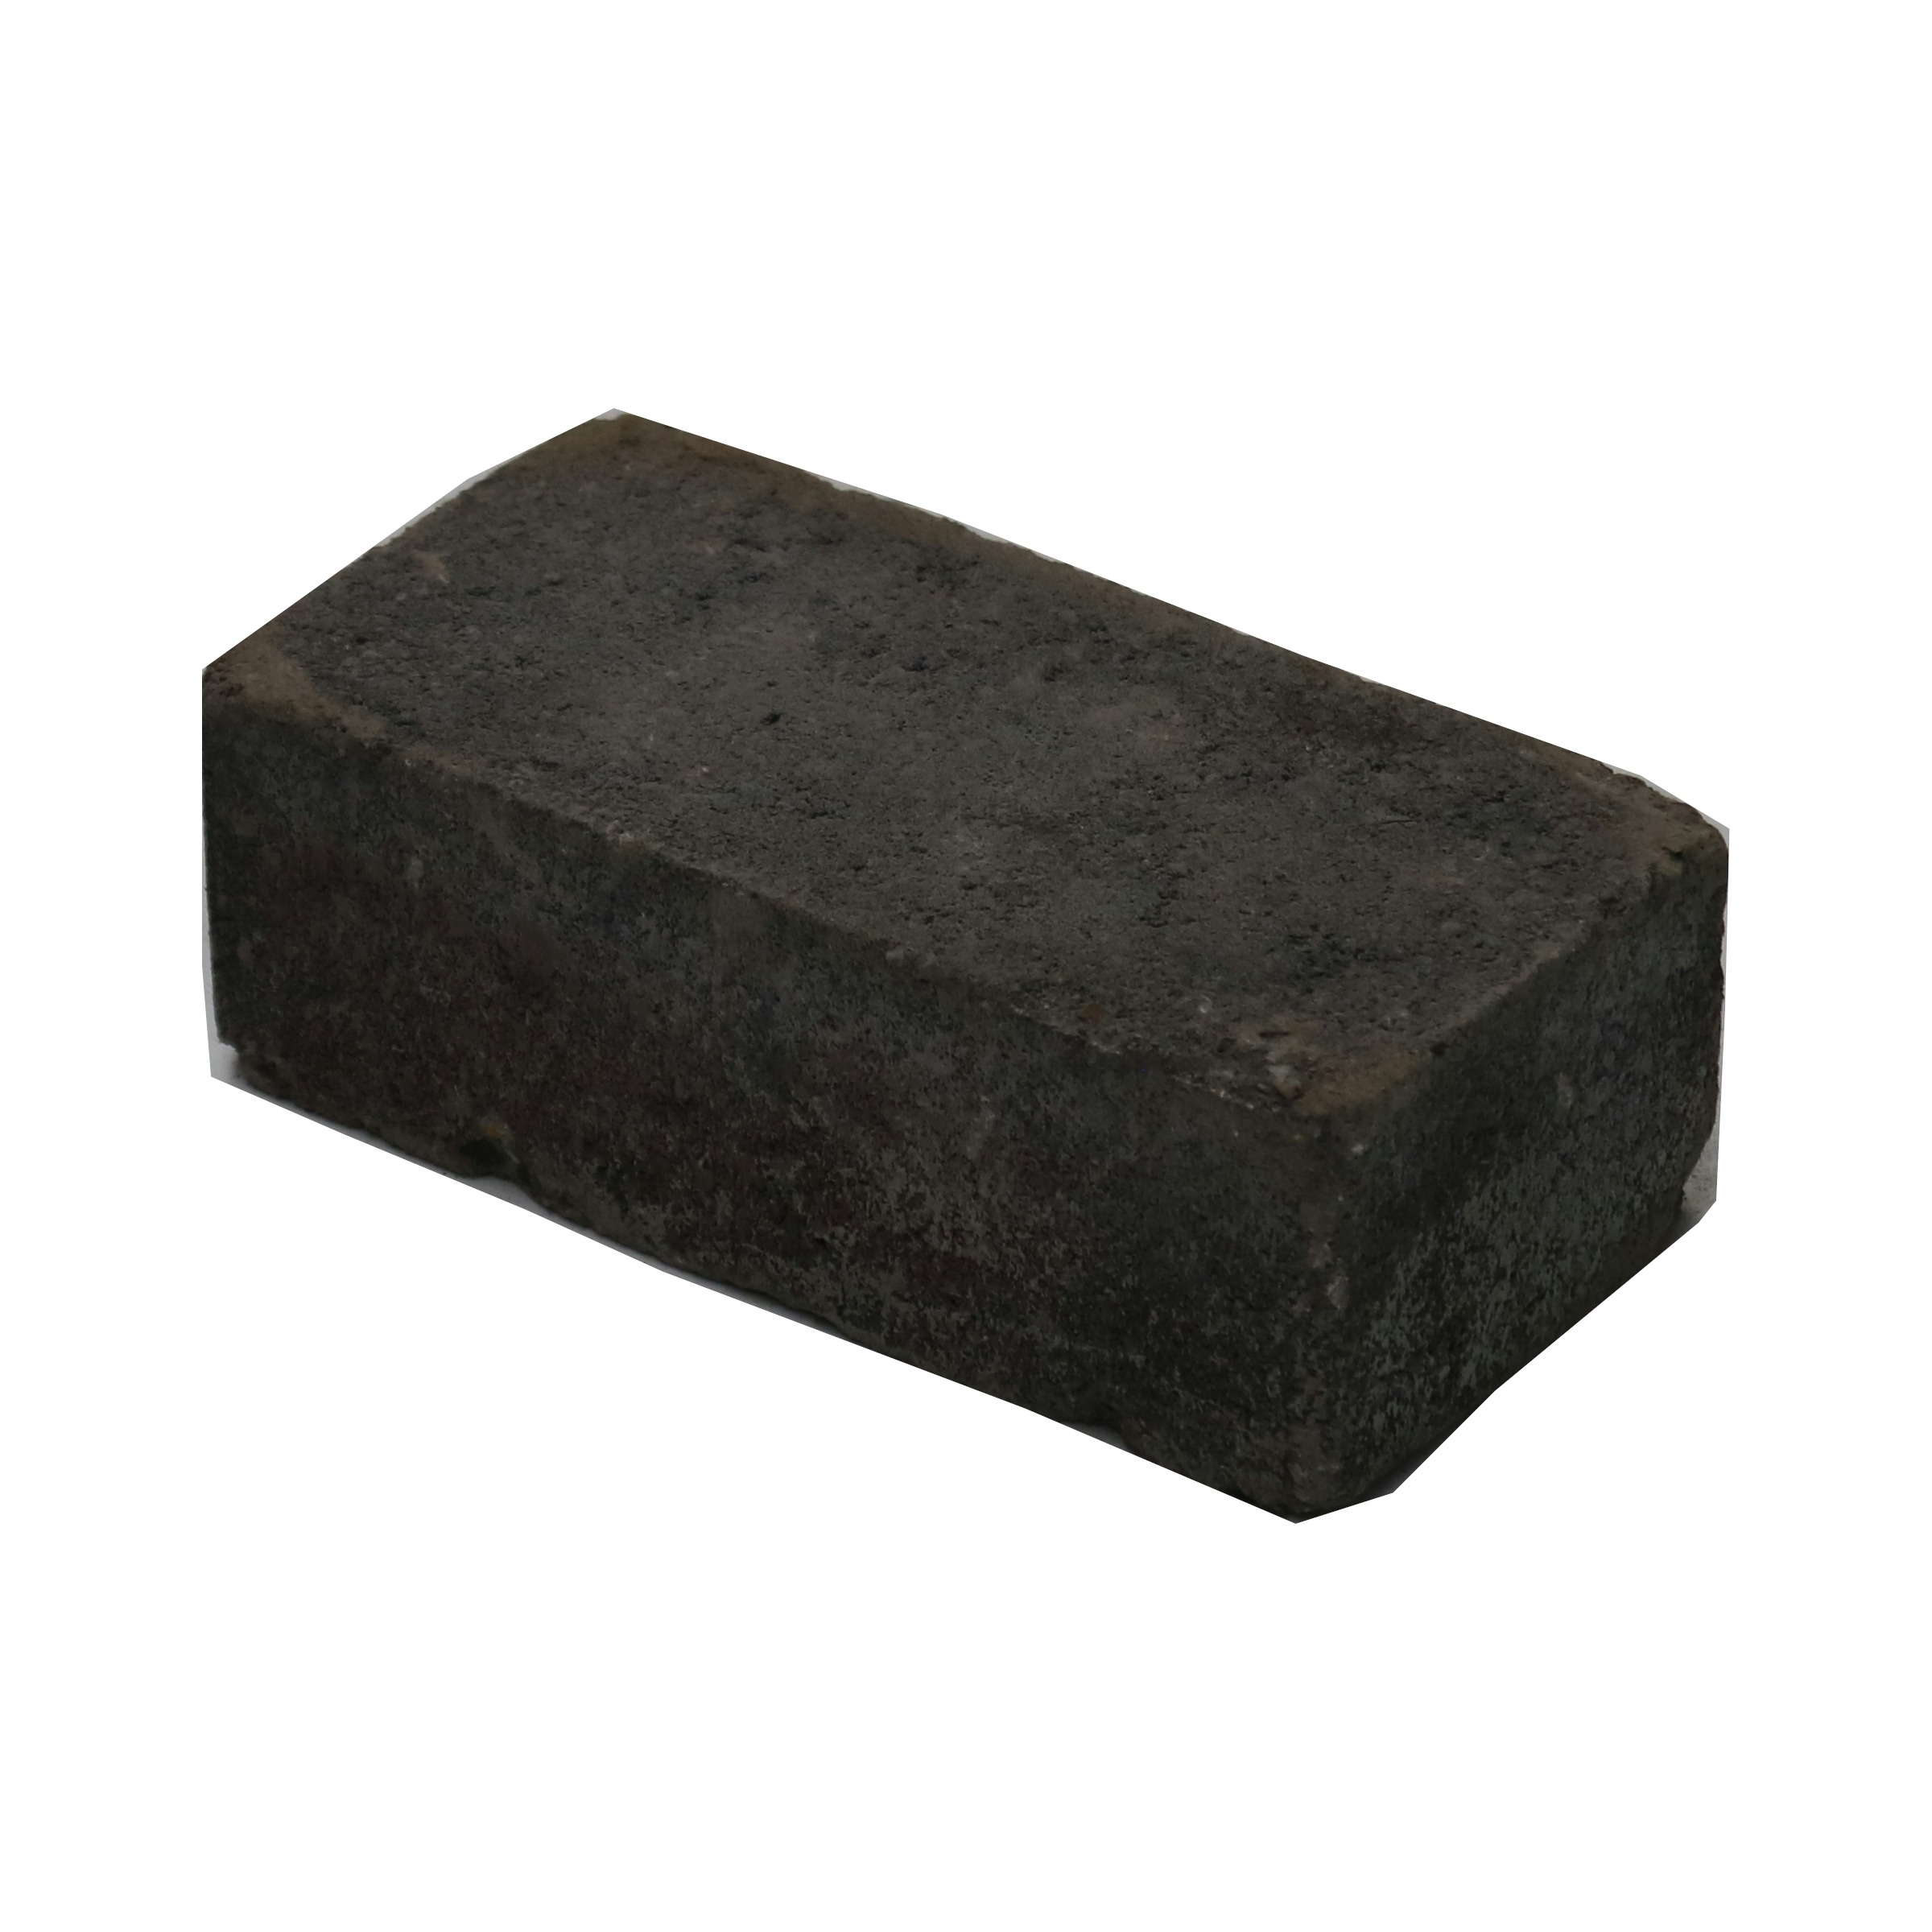 Klinker Beton Getrommeld Grijs/Zwart 21x10,5x7 cm - 288 Klinkers - 4,03 m2